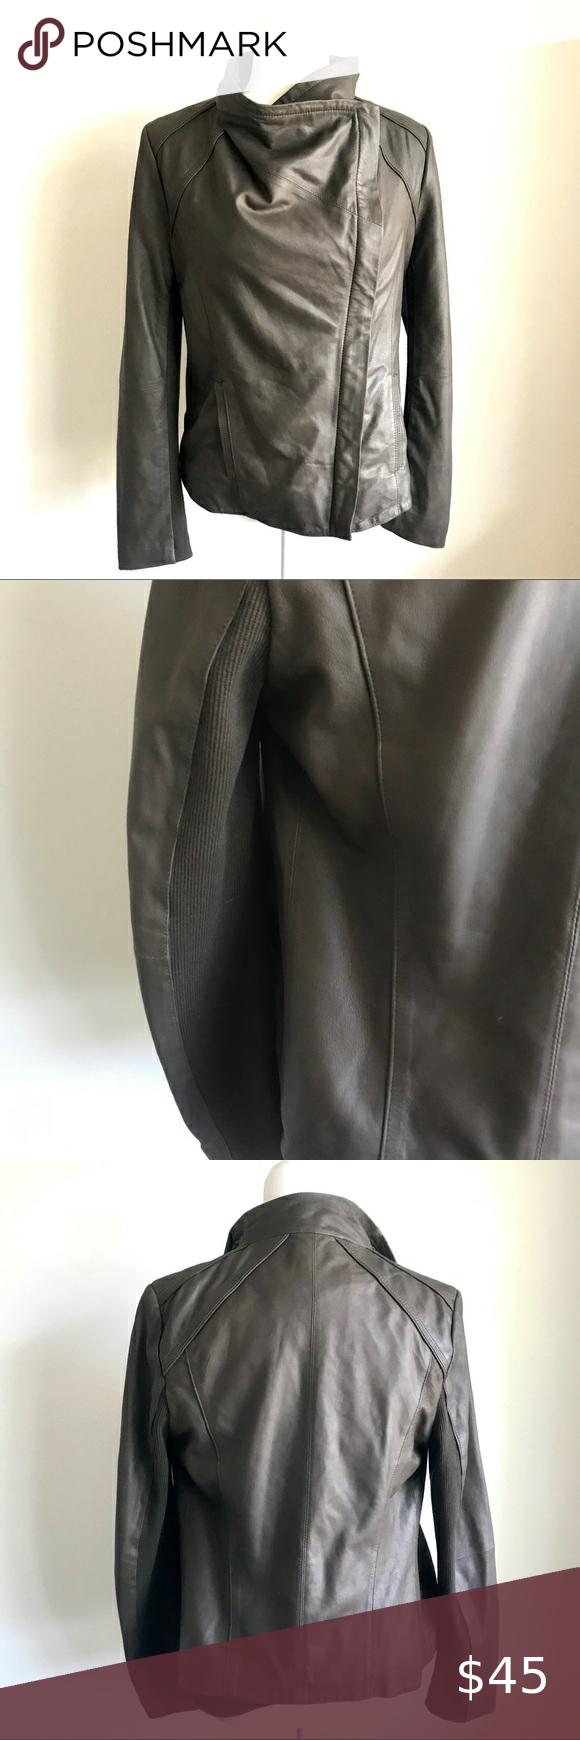 Brown Elie Tahari Leather Moro Jacket Leather Jacket Brands Elie Tahari Jacket Blue Leather Jacket [ 1740 x 580 Pixel ]